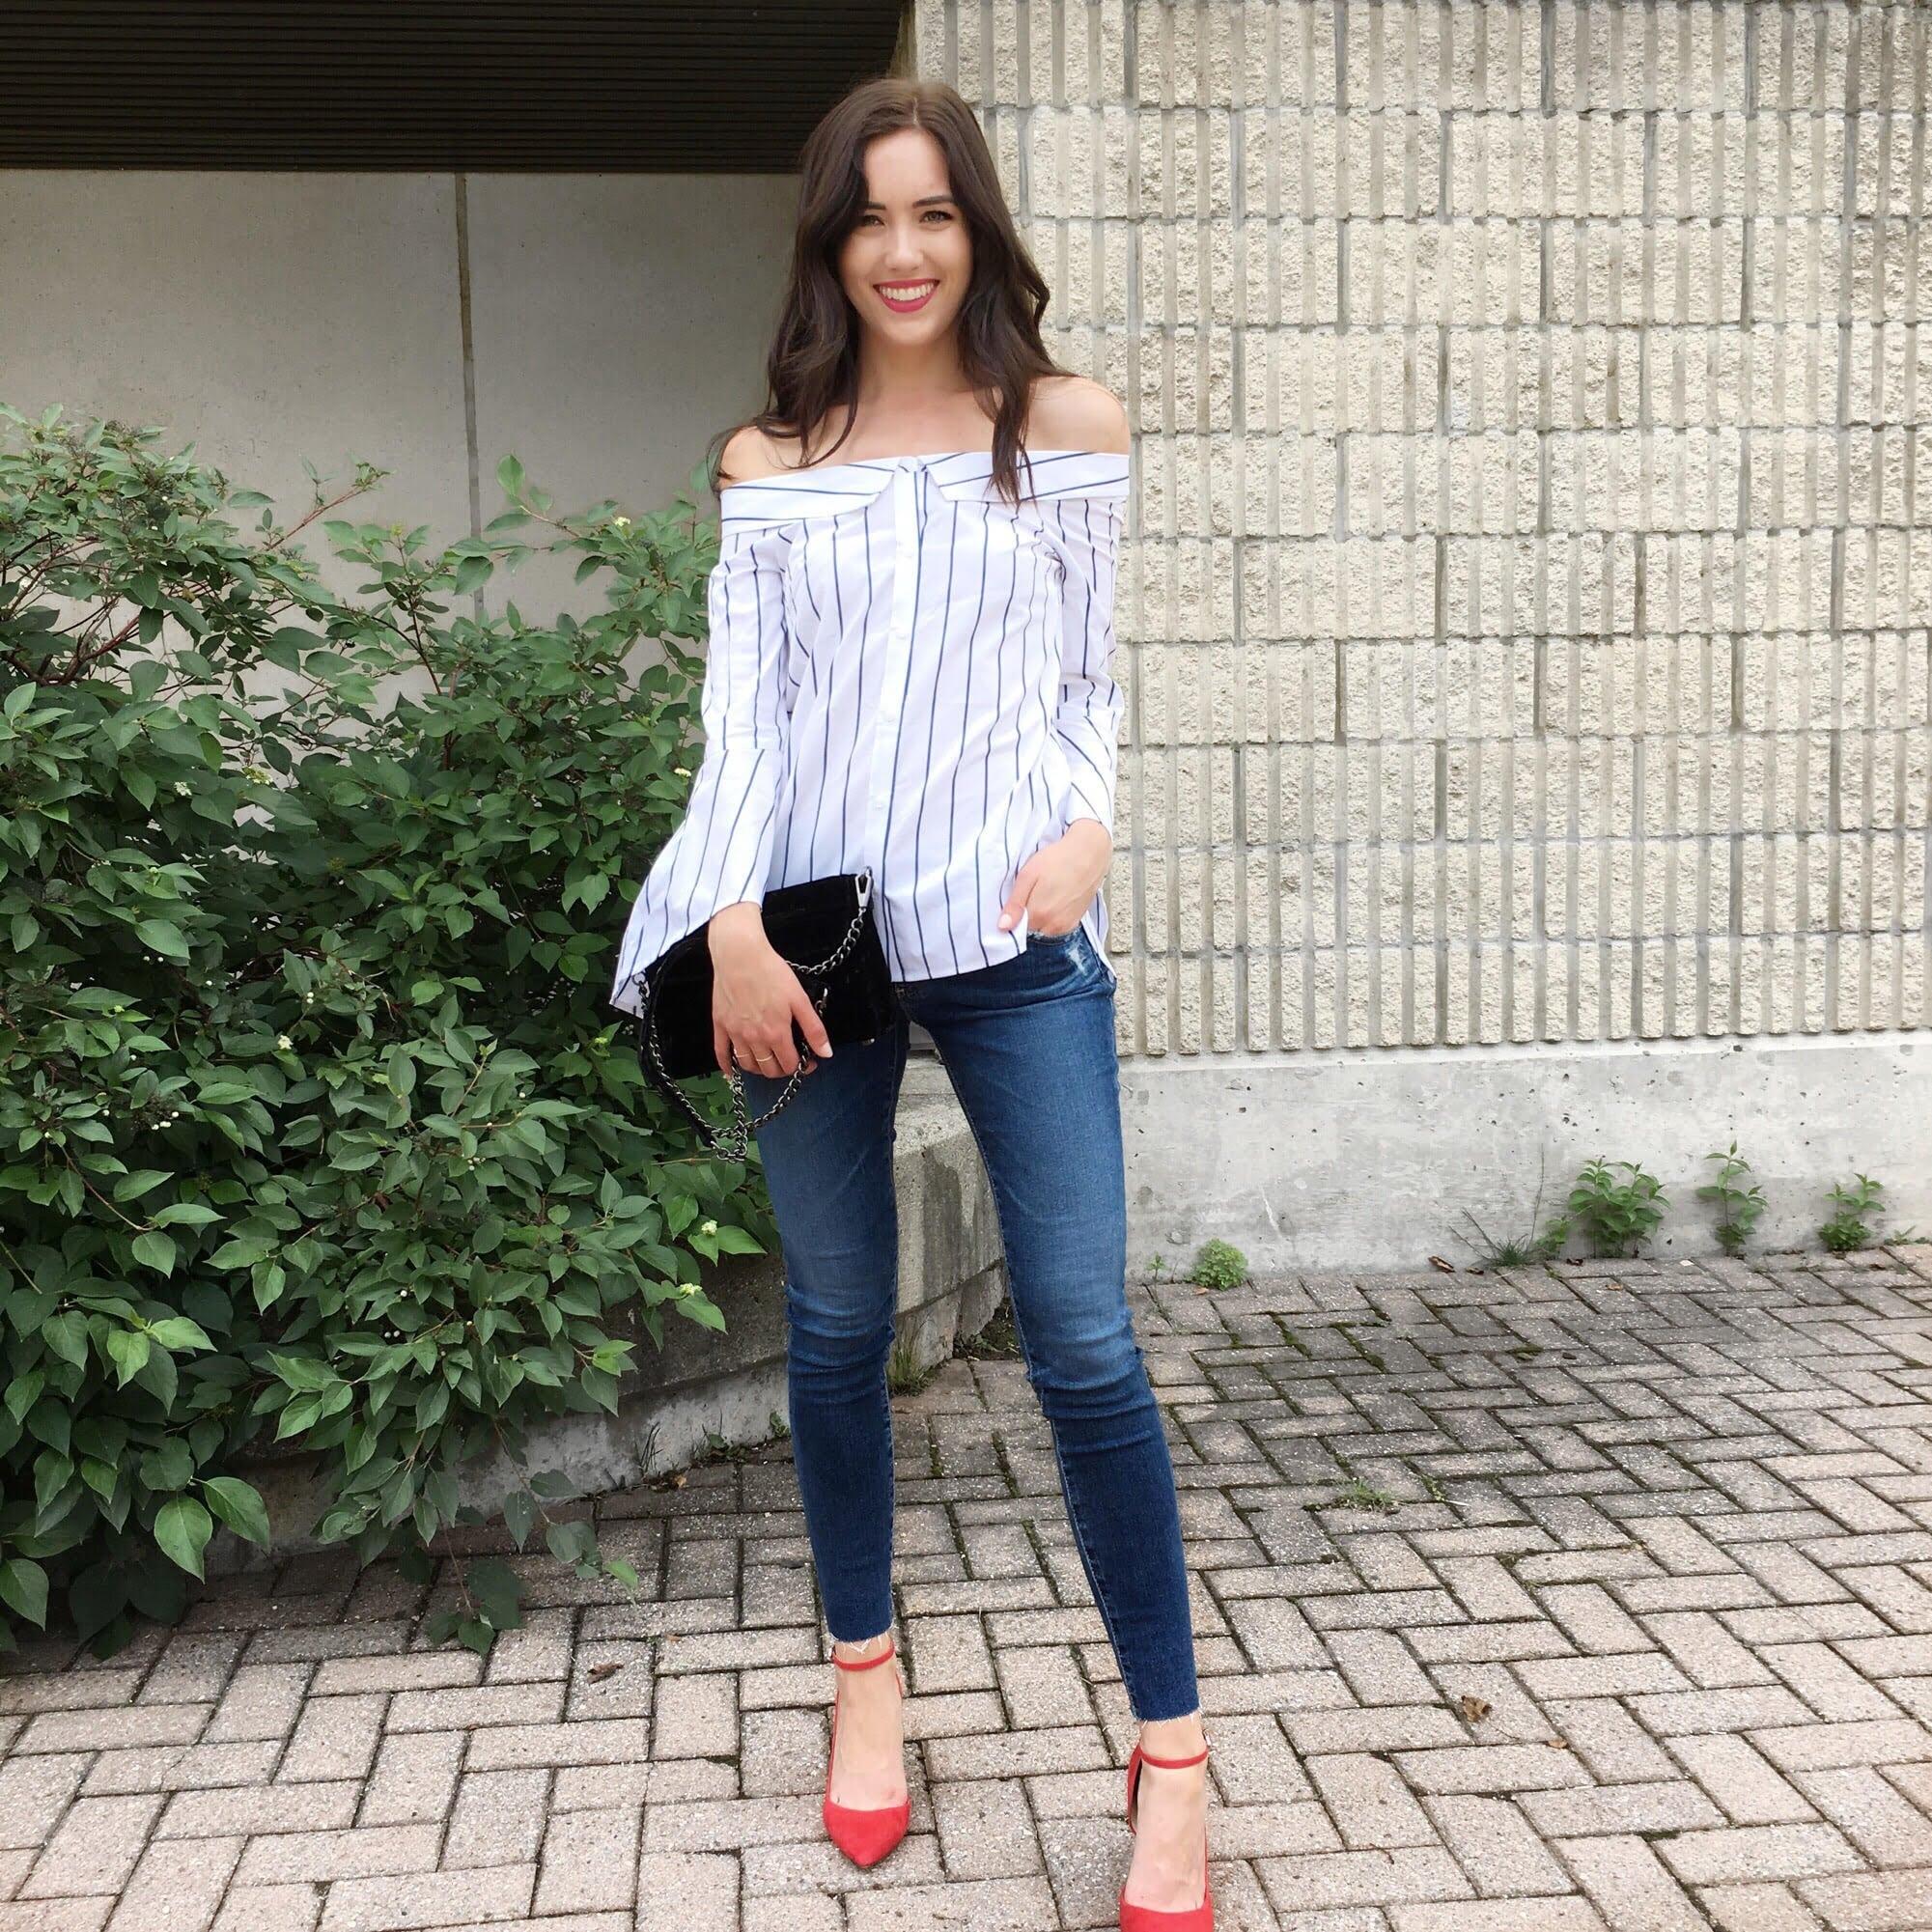 Nordstrom try on haul | beauty style blogger Mash Elle |  Nordstrom Anniversary Sale  | marie's bazaar